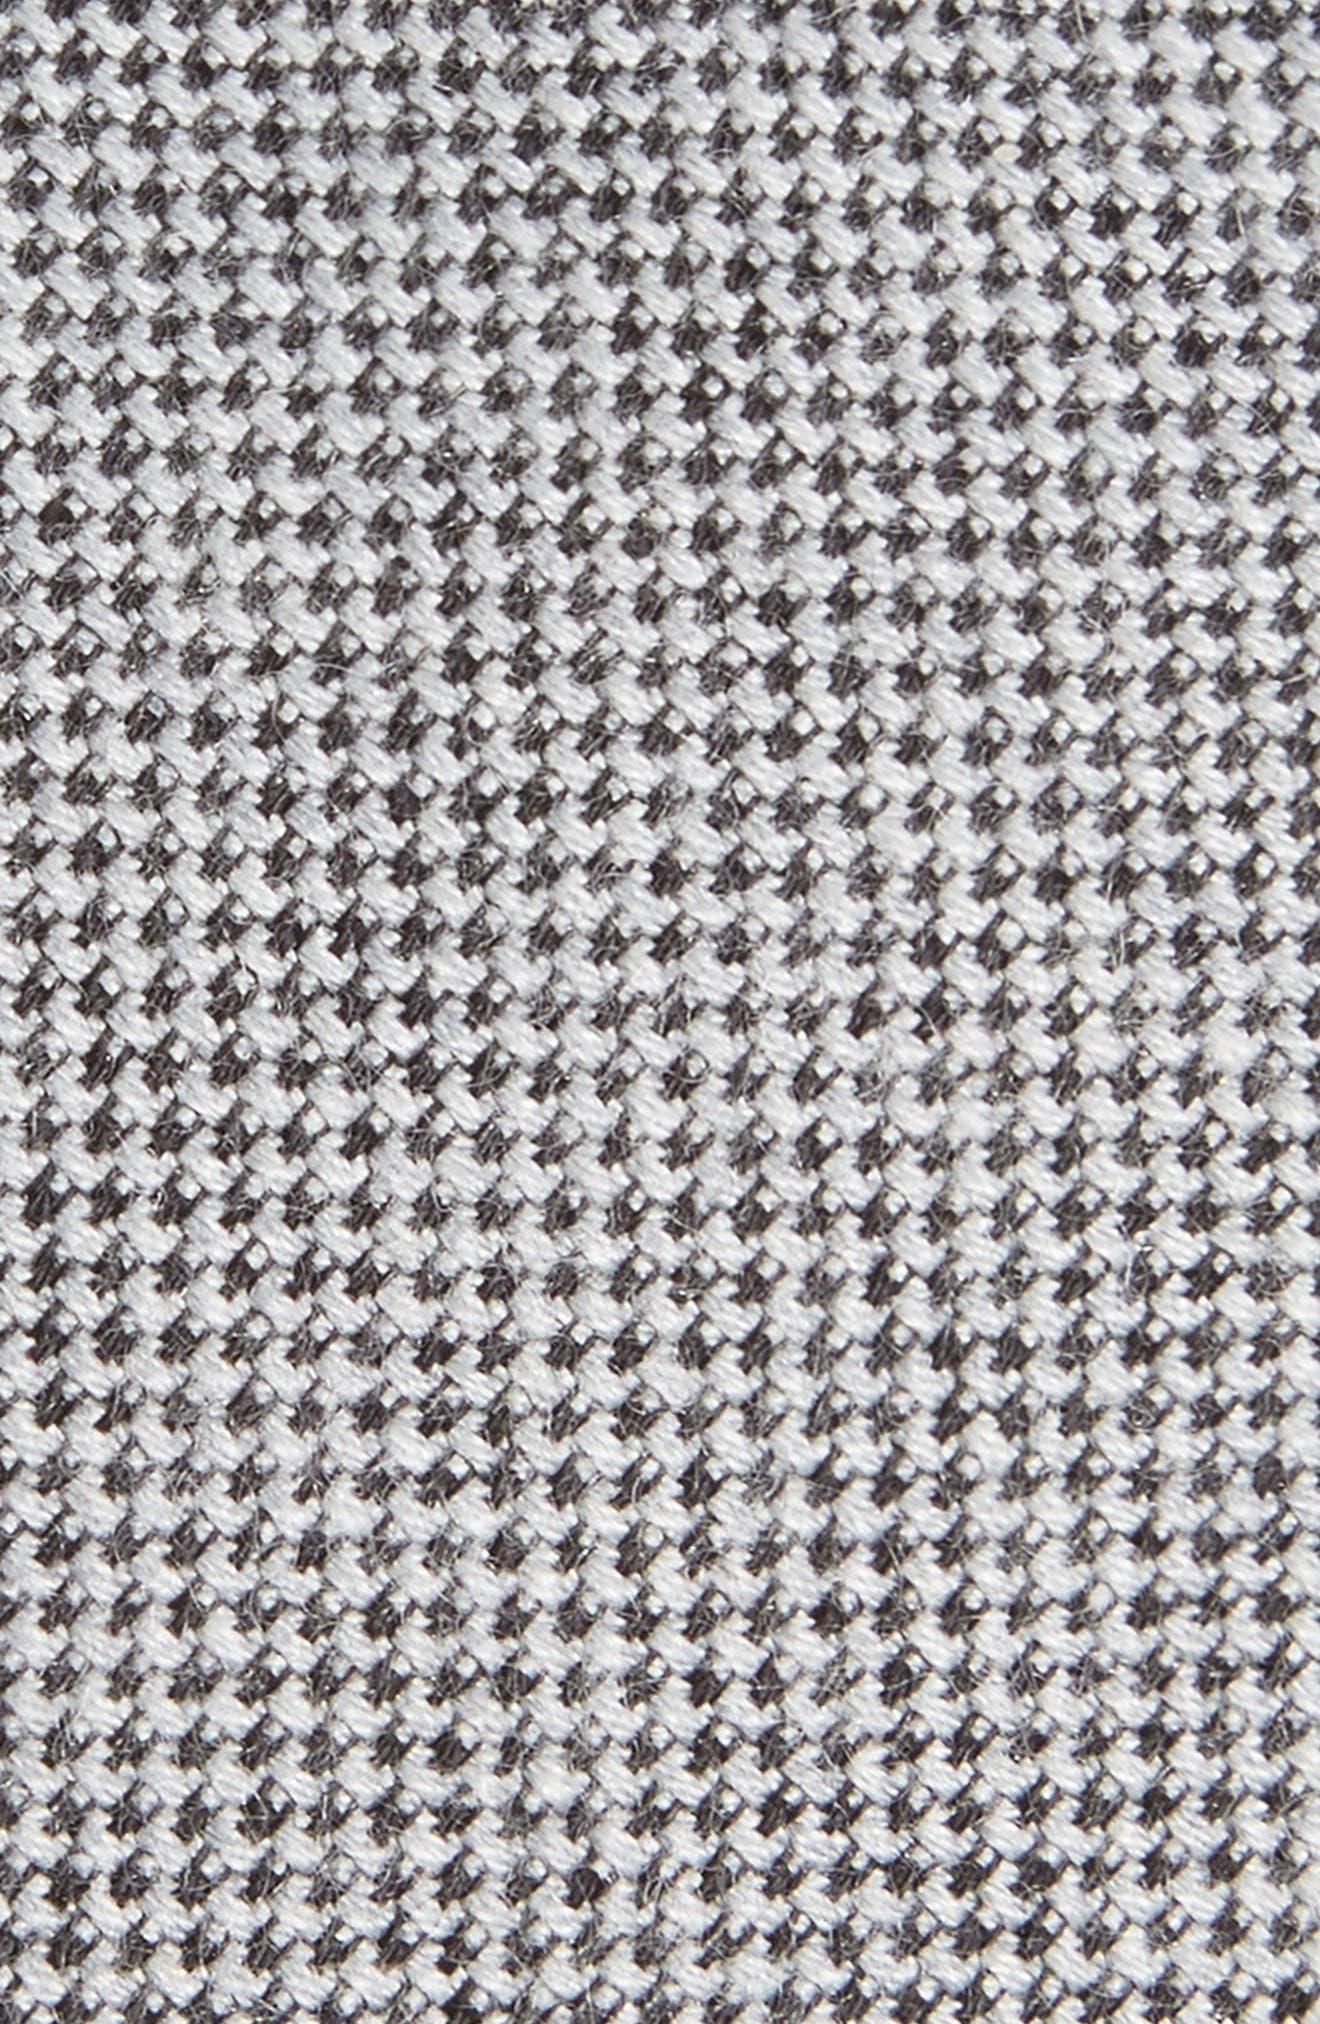 Small Bird's Eye Silk Blend Tie,                             Alternate thumbnail 2, color,                             001